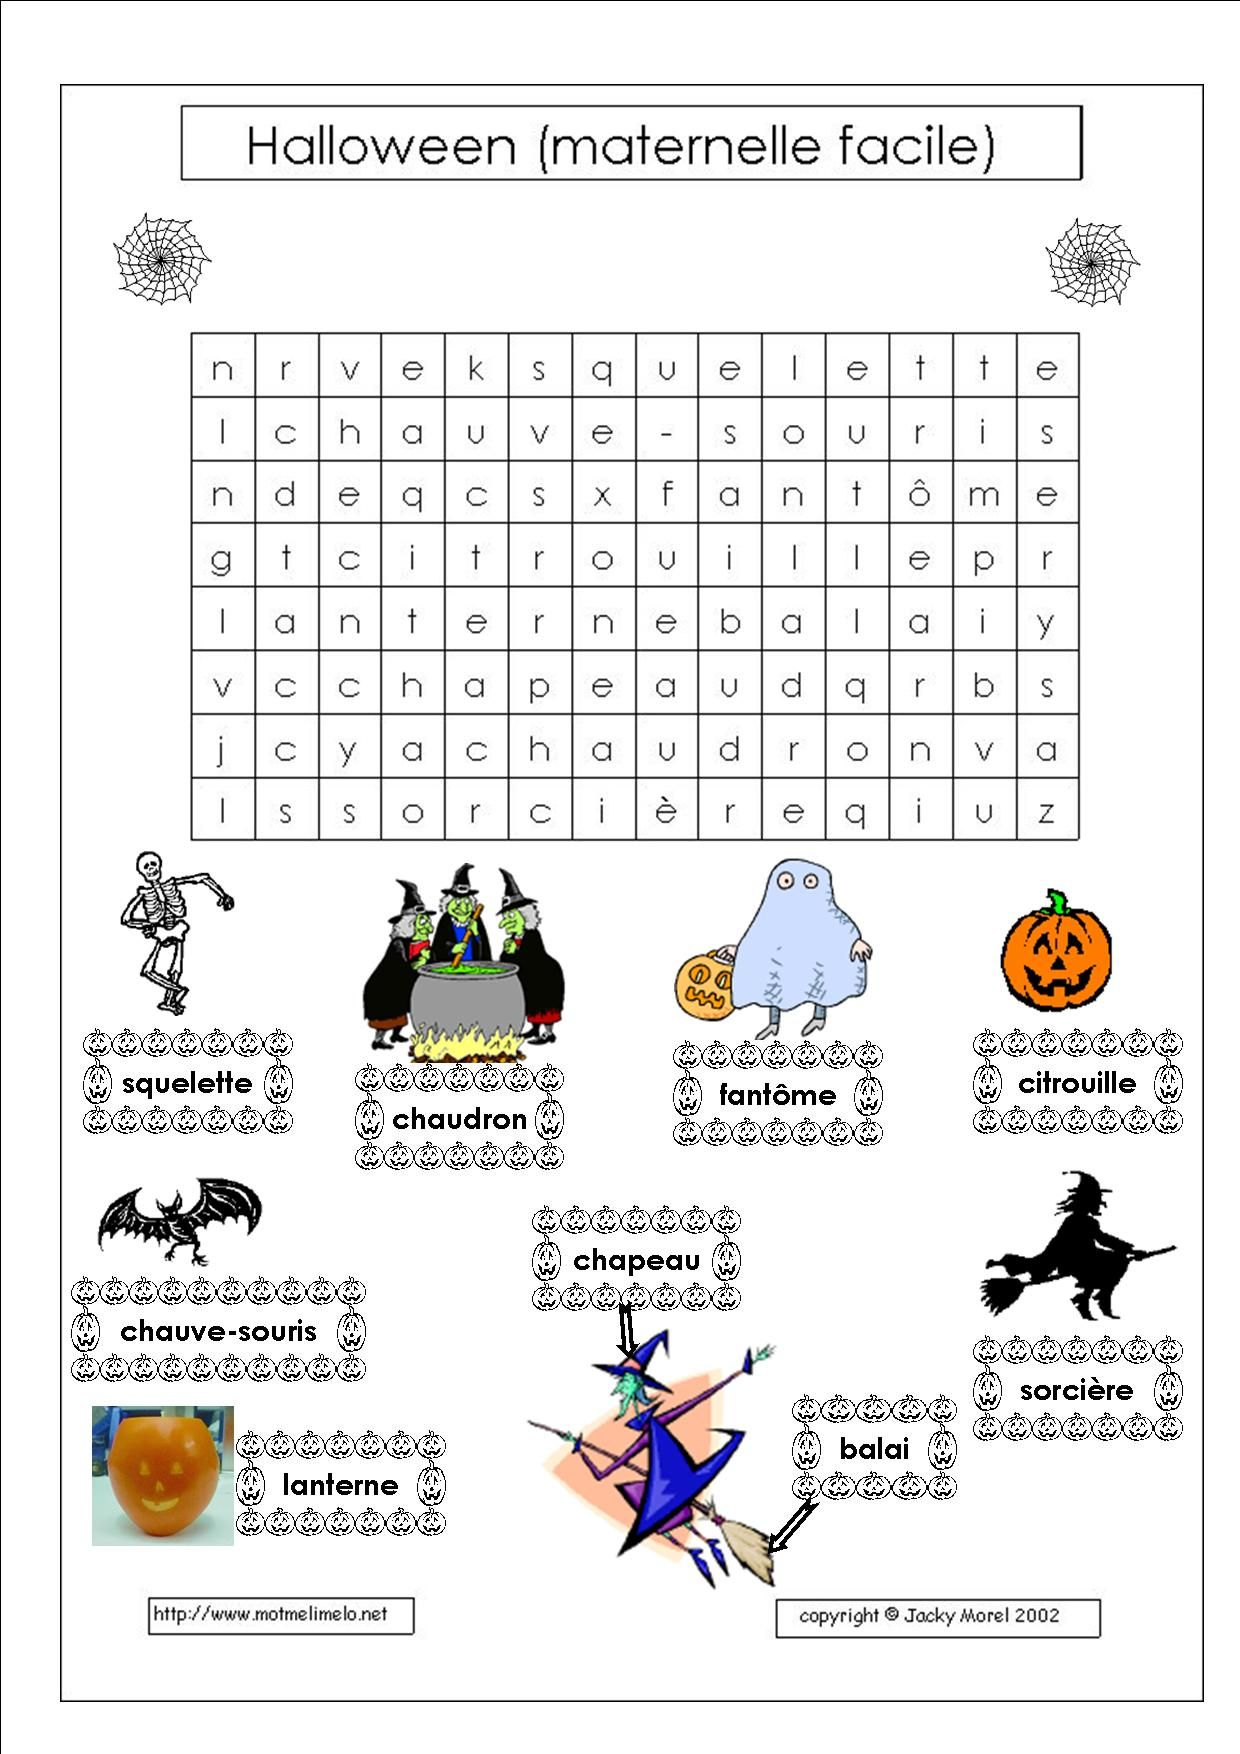 halloween maternelle facile halloween pinterest maternelle halloween et activit. Black Bedroom Furniture Sets. Home Design Ideas